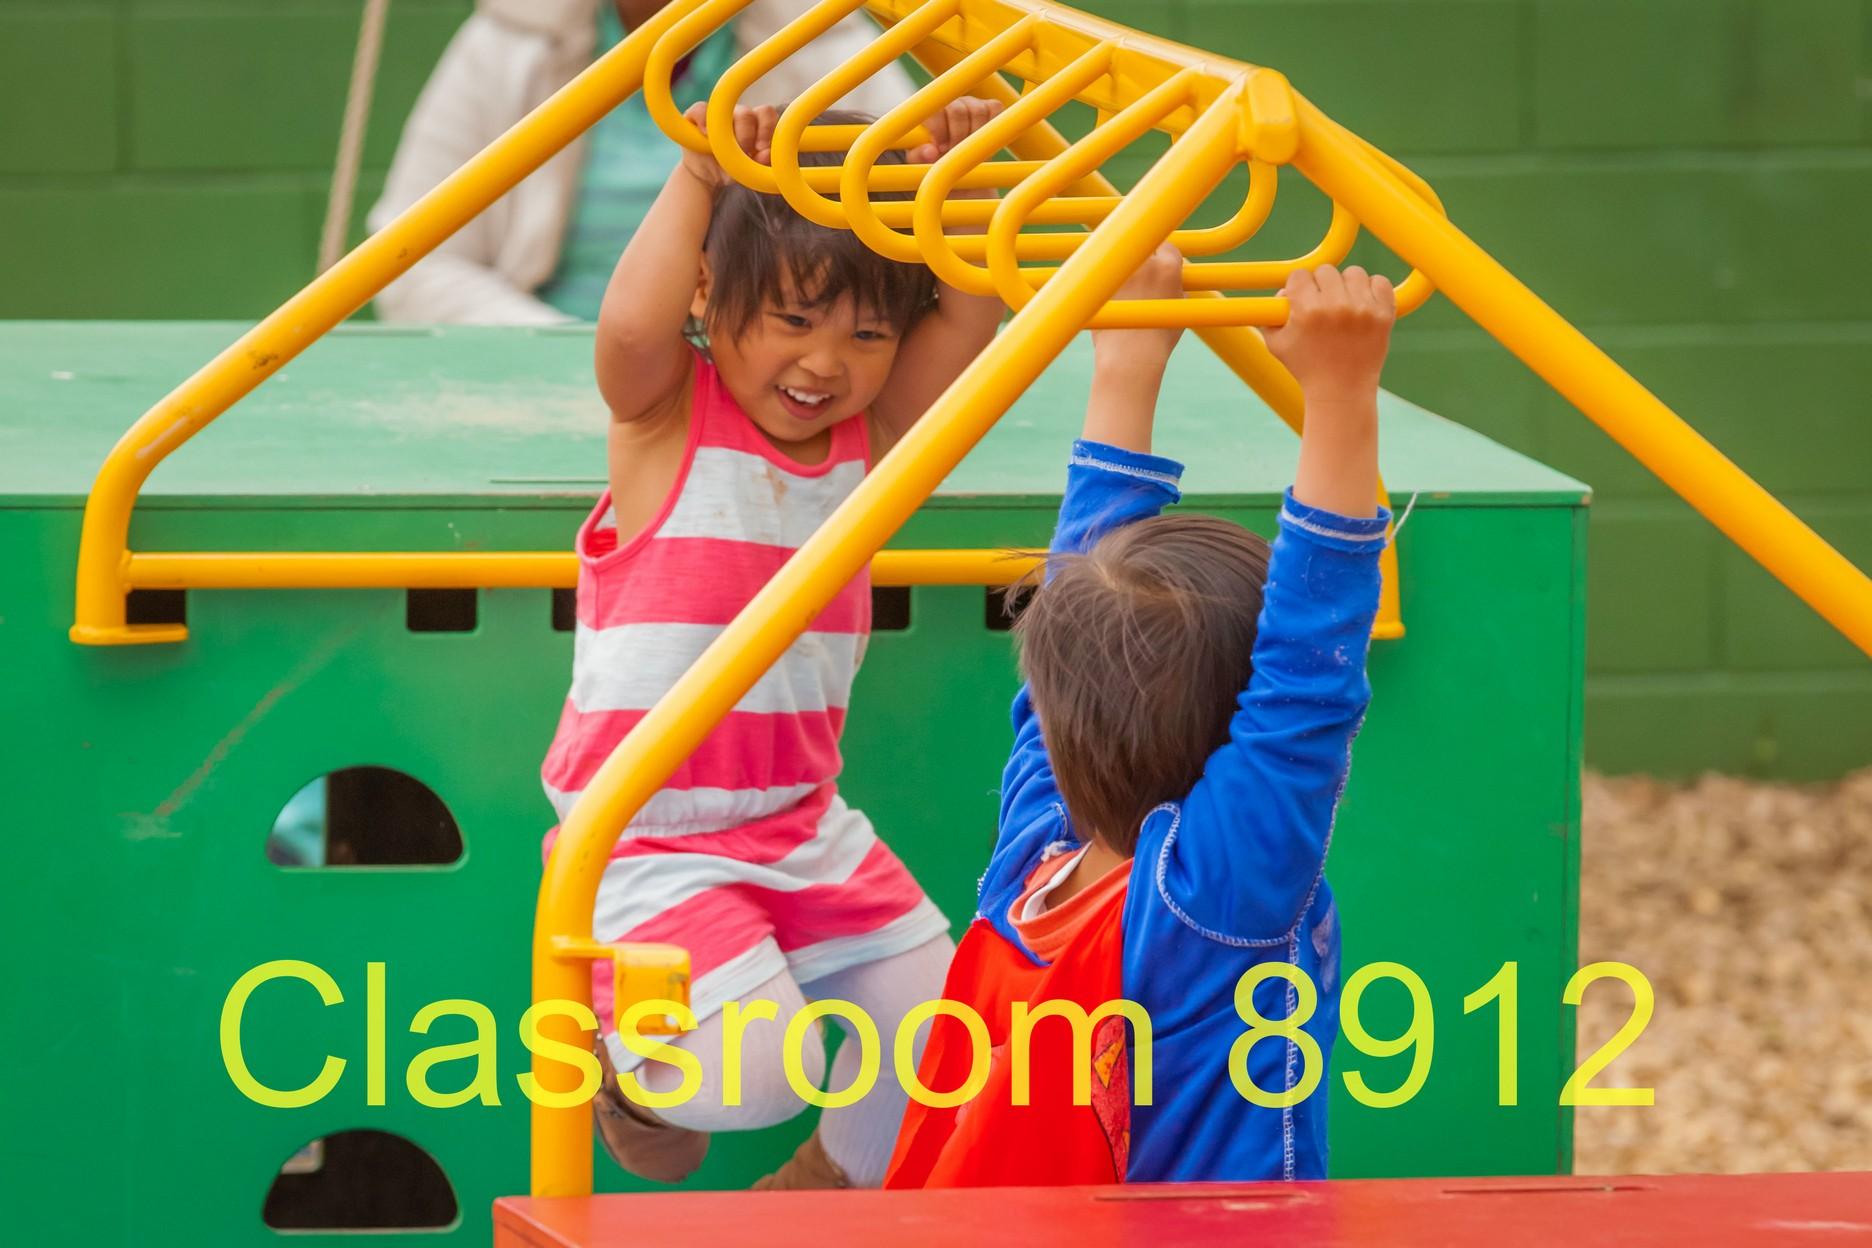 Classroom 8912